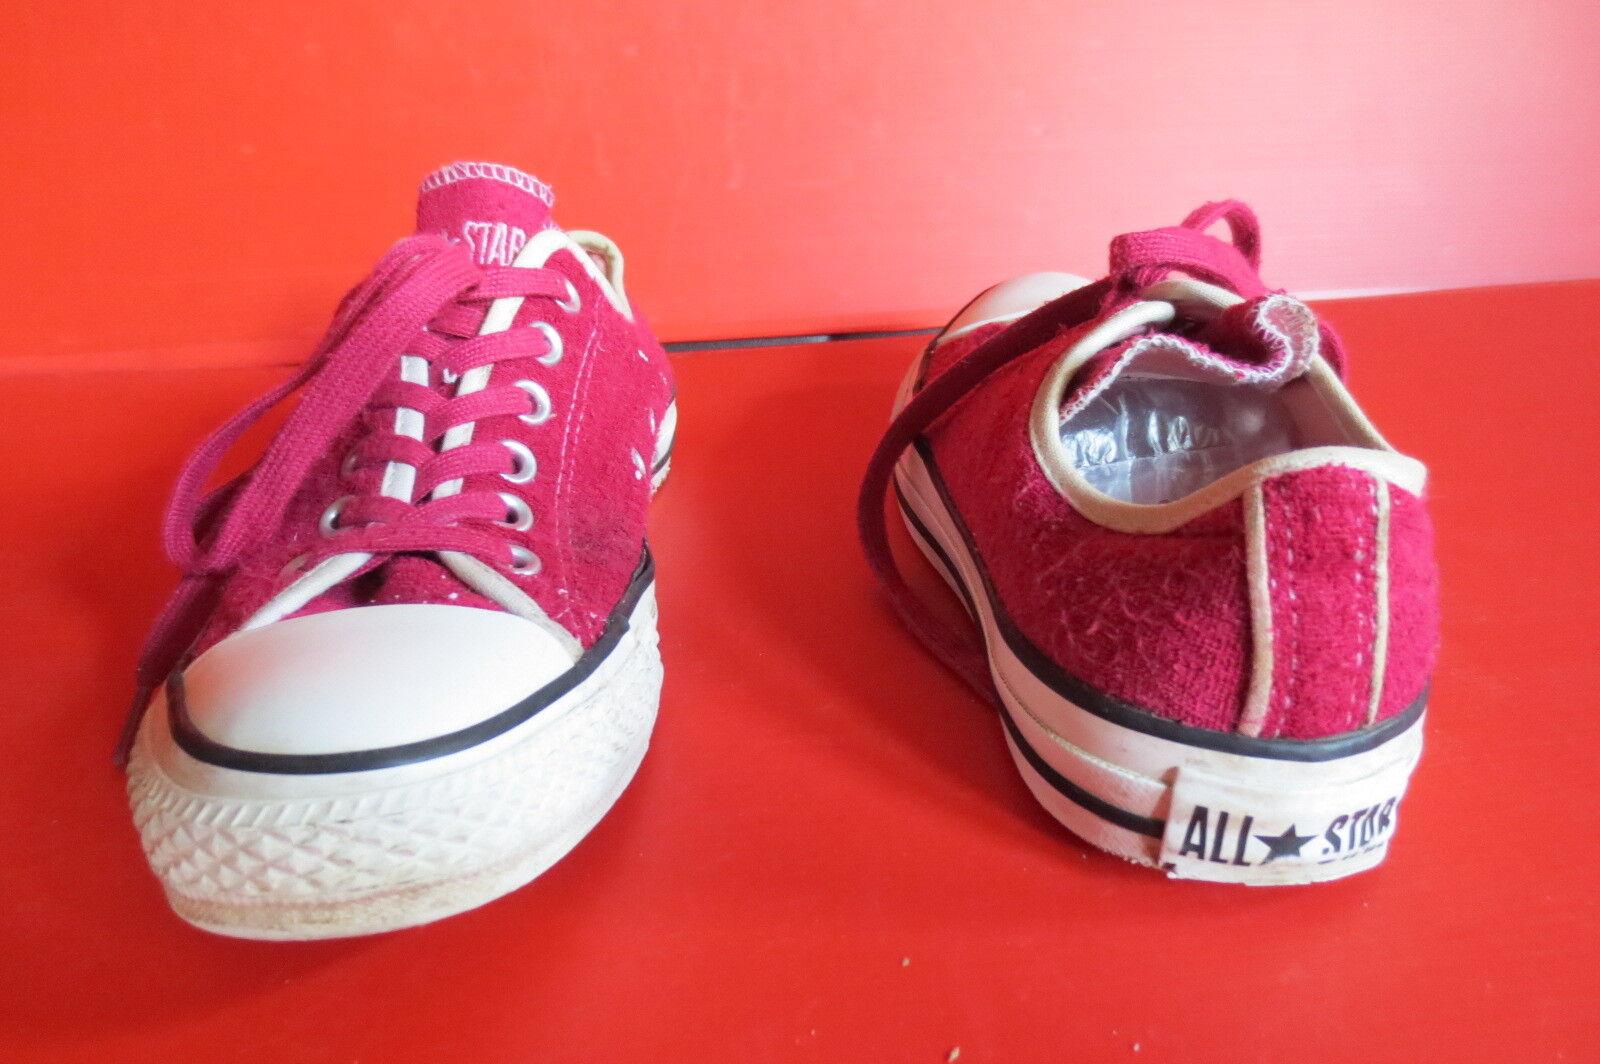 Converse Chuck All Taille Star Textile Low floconneux bordeaux Taille All 38 (5 1/2) nº 48 Unisexe 899810